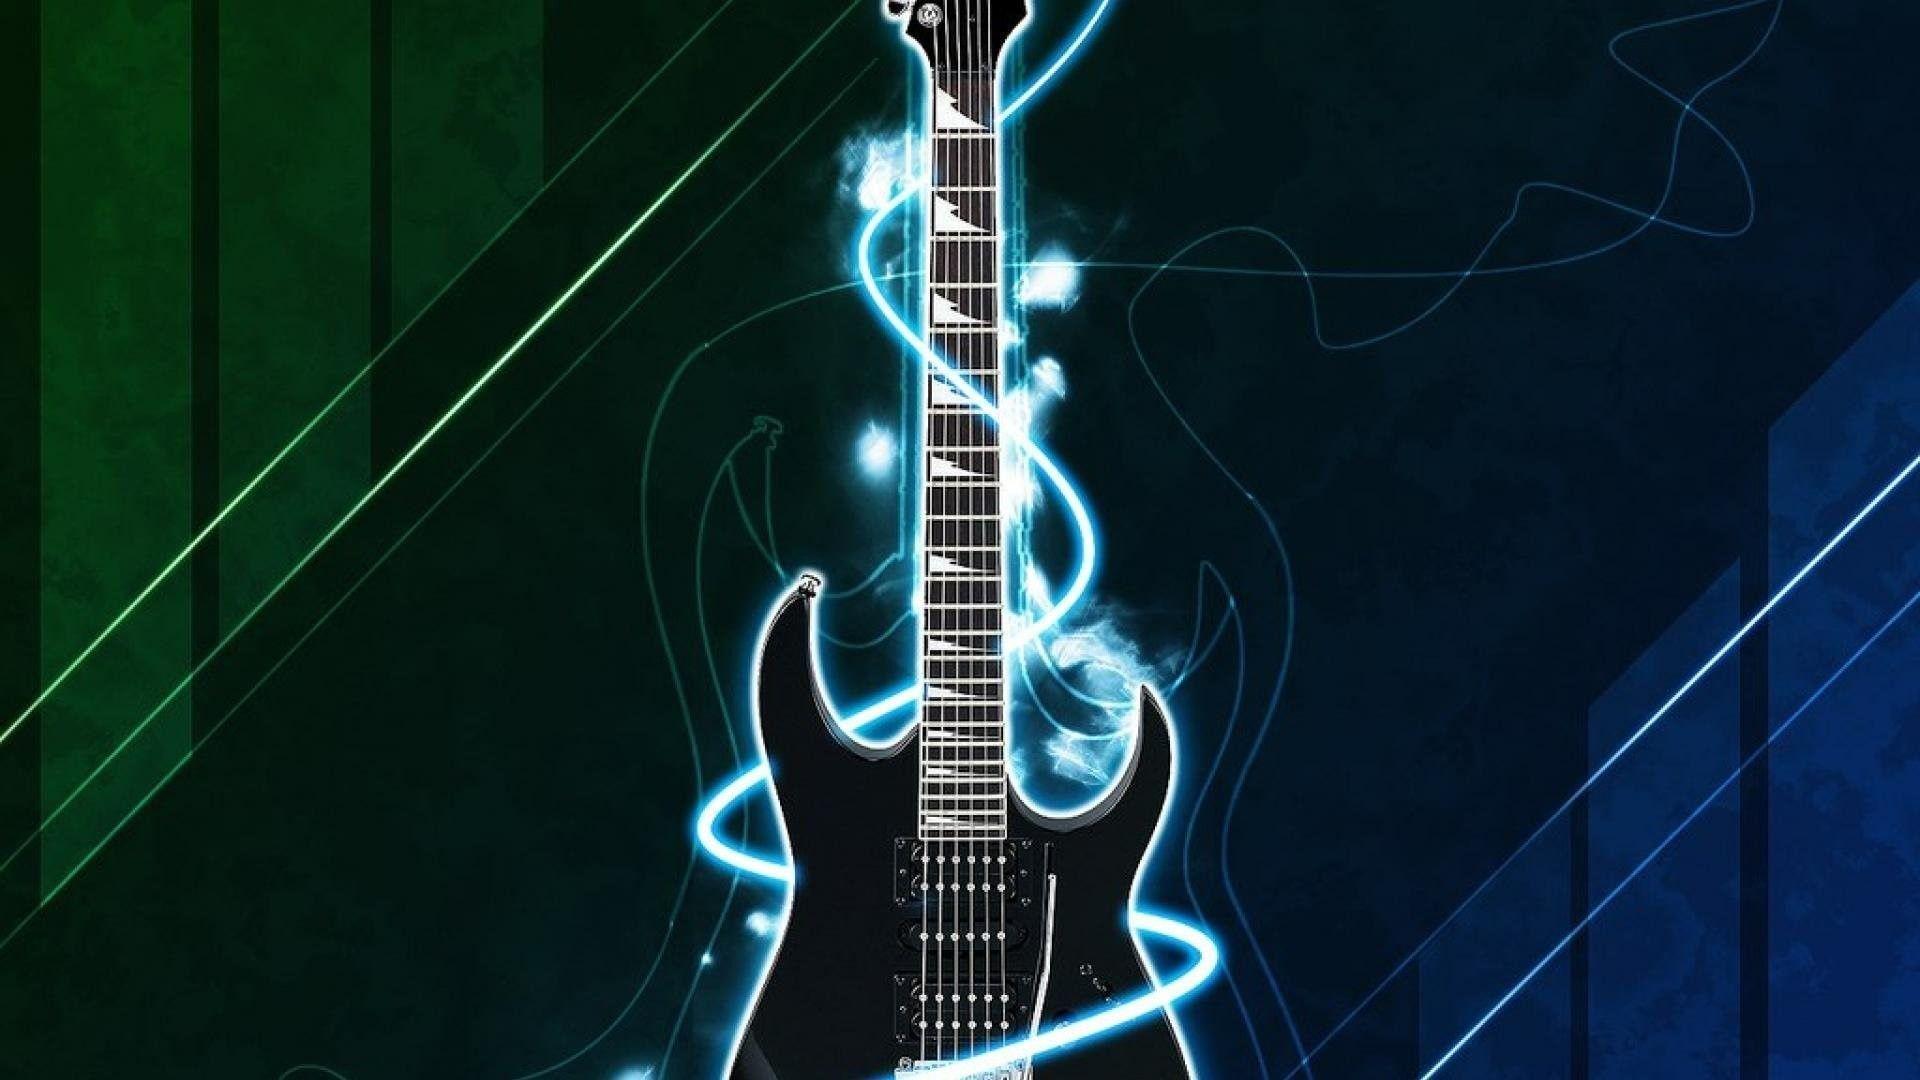 Unduh 600 Wallpaper Biru Gitar  Gratis